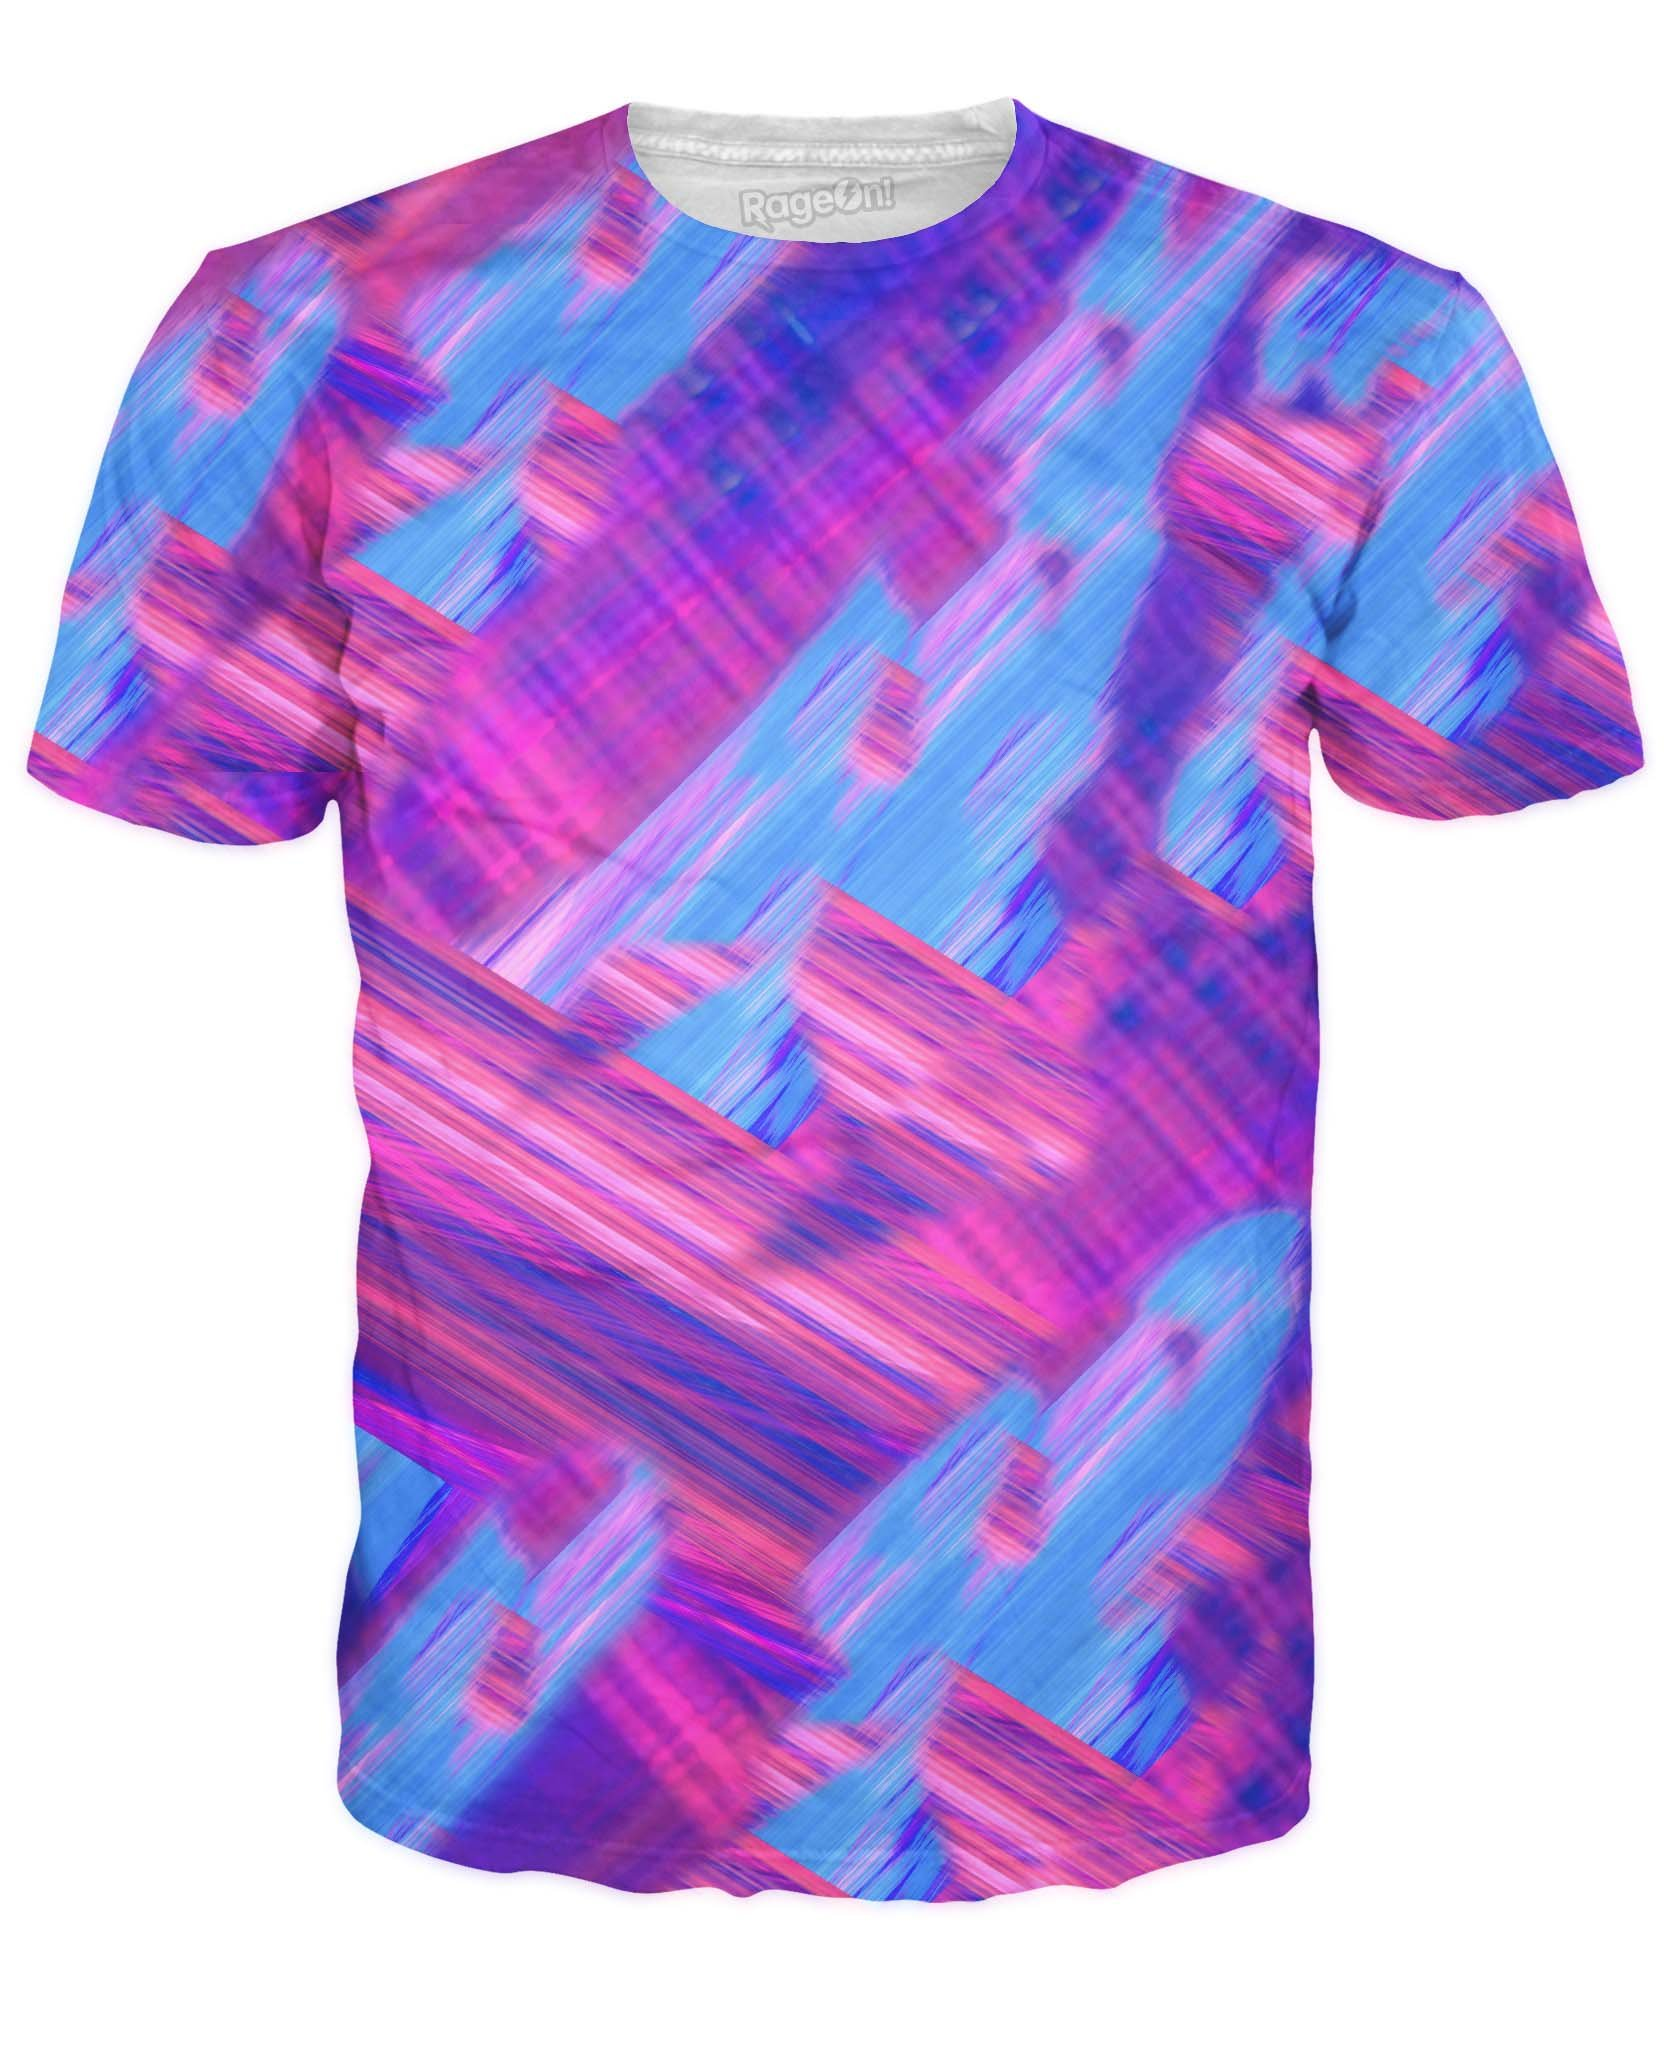 RageOn Men's Glaciers T-Shirt Neon Pink Purple Blue